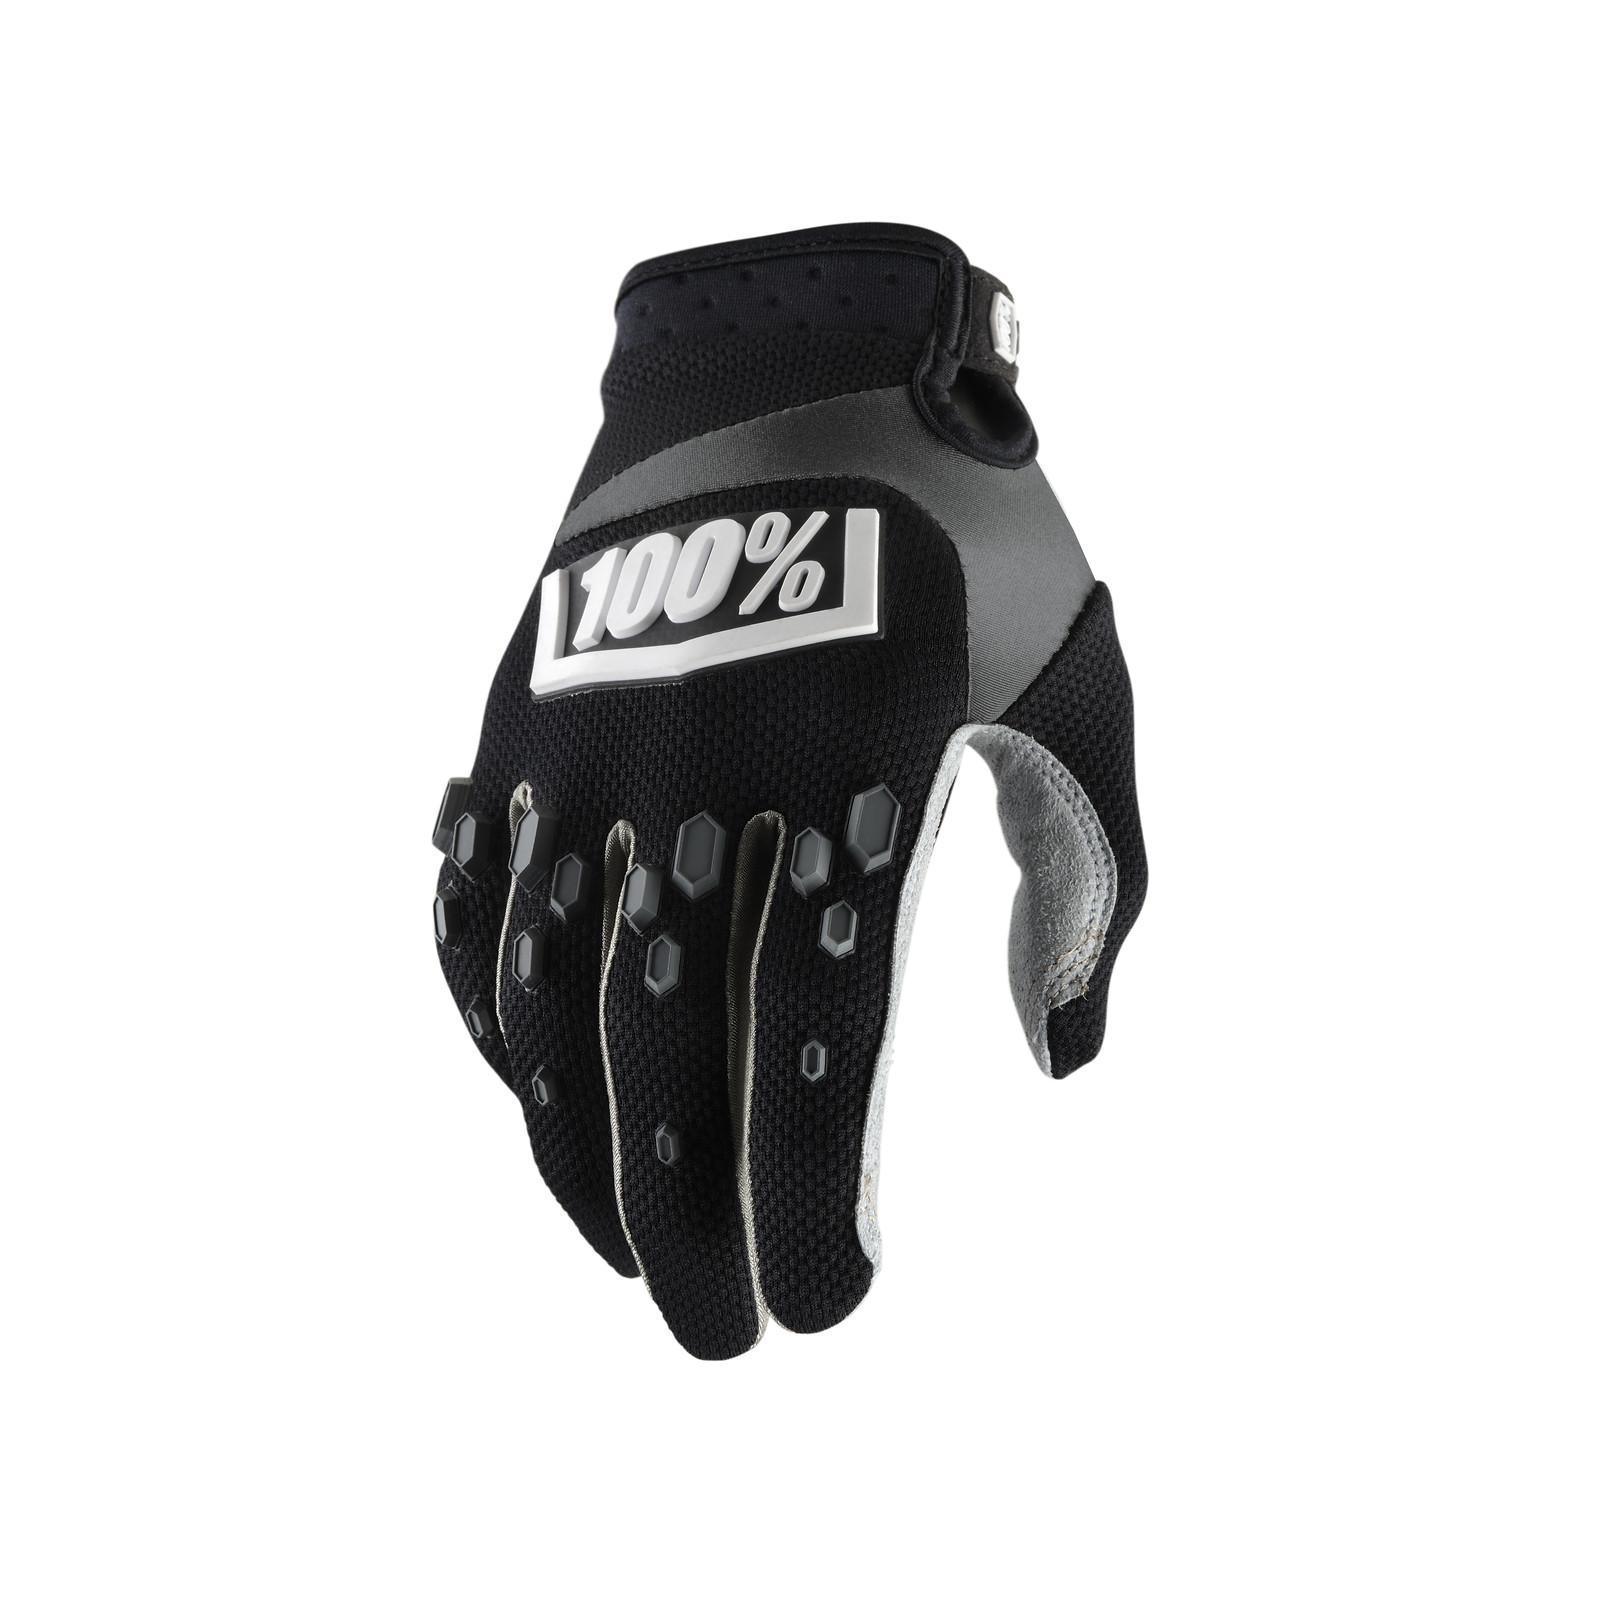 Airmatic Glove - Black - 100percent - Motocross Pictures - Vital MX